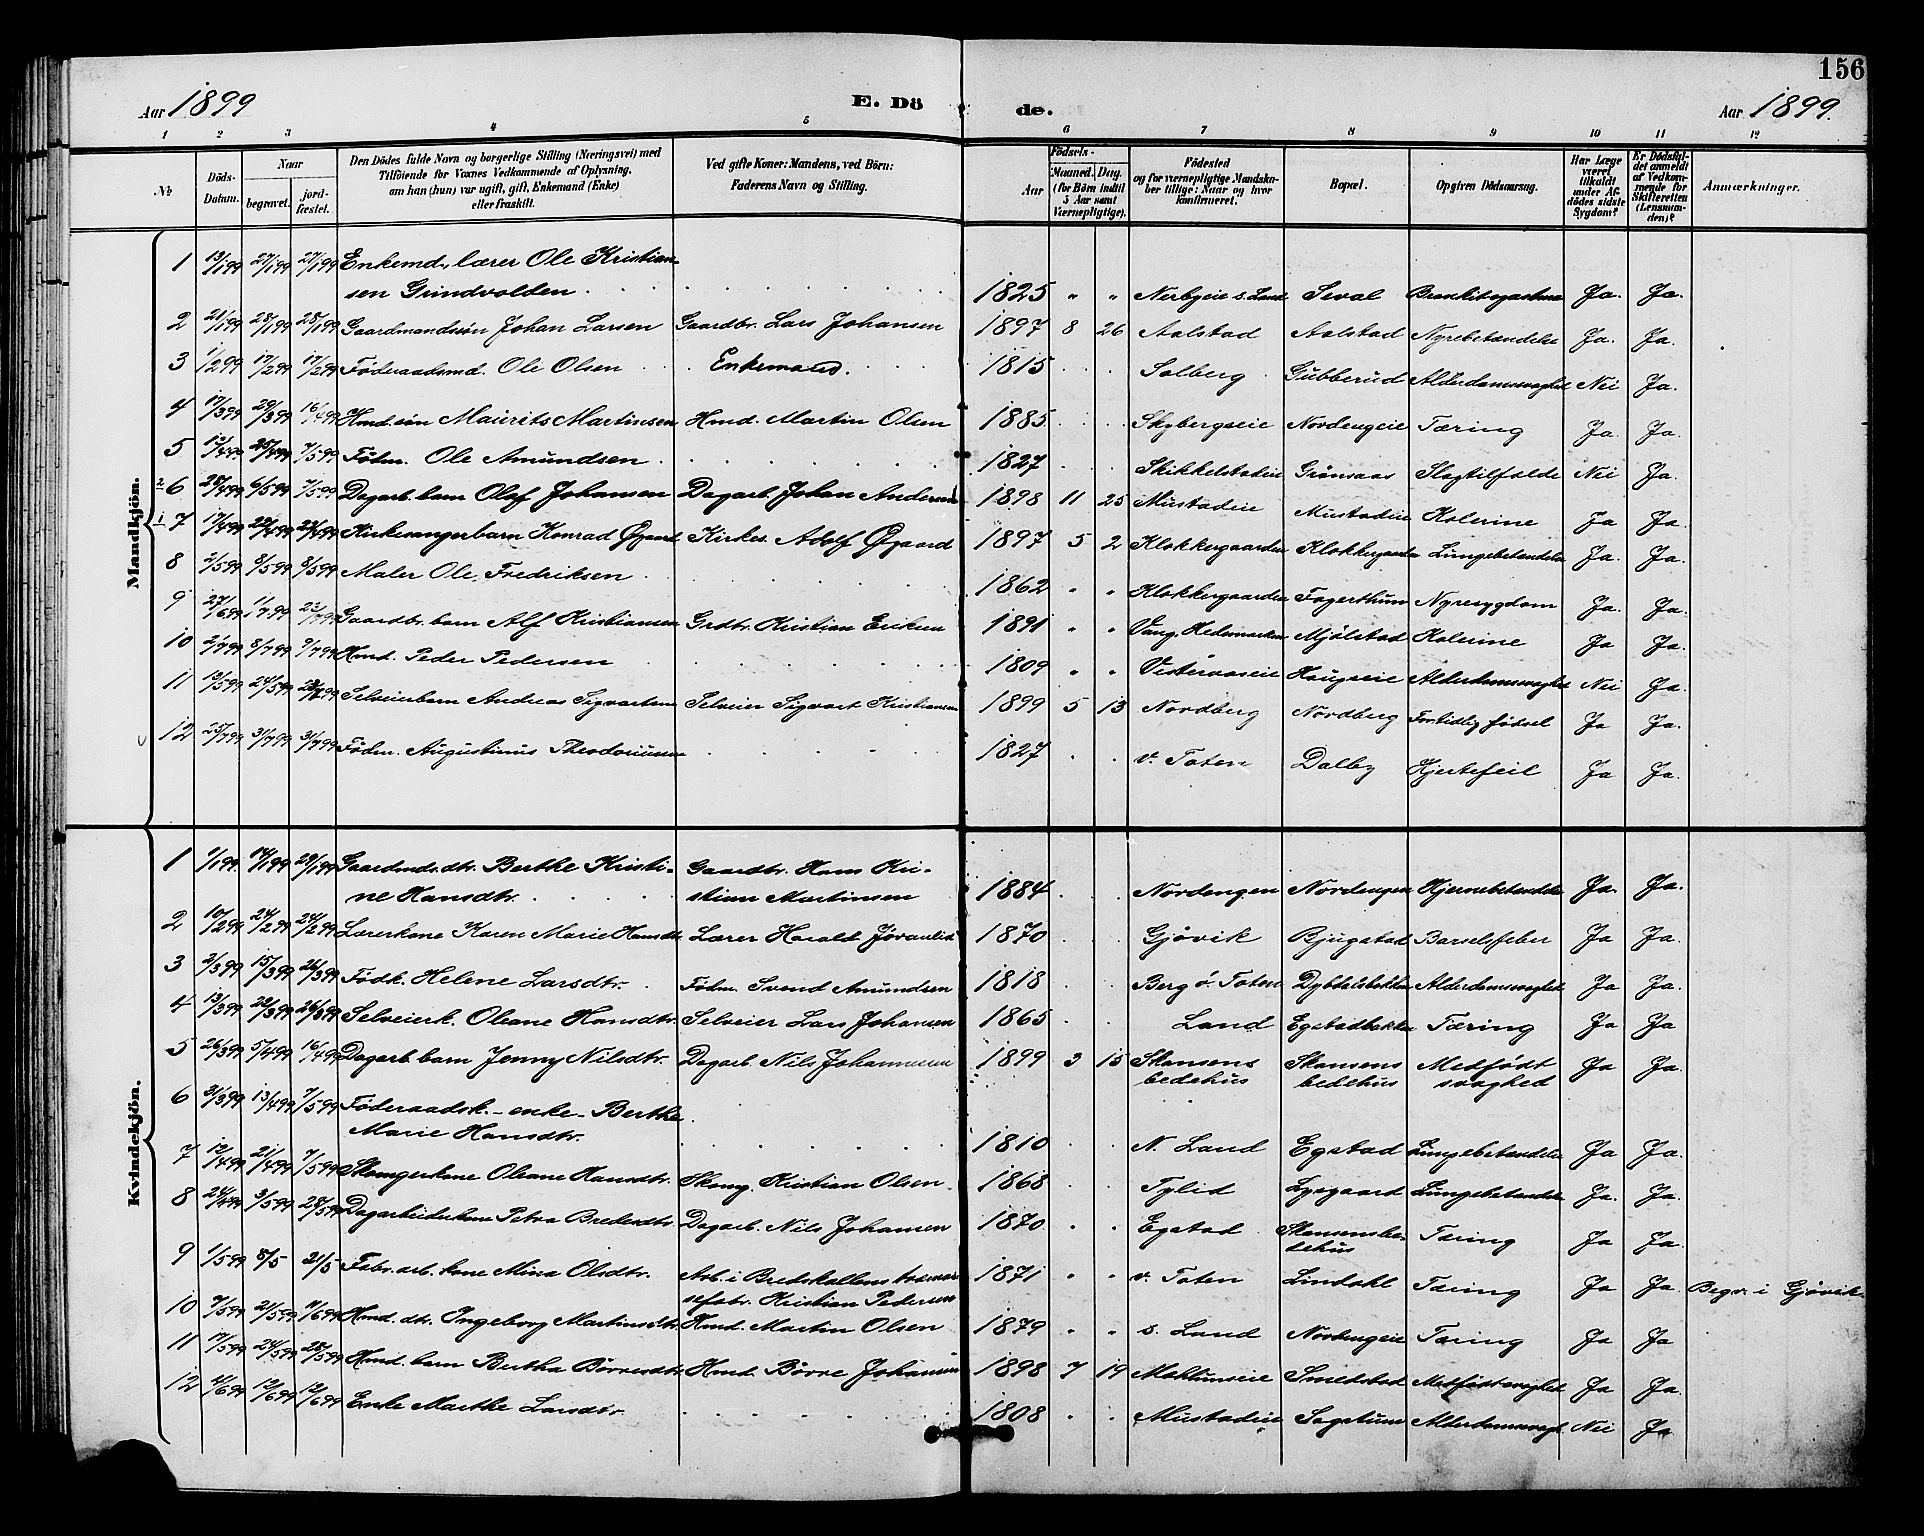 SAH, Vardal prestekontor, H/Ha/Hab/L0011: Klokkerbok nr. 11, 1899-1913, s. 156